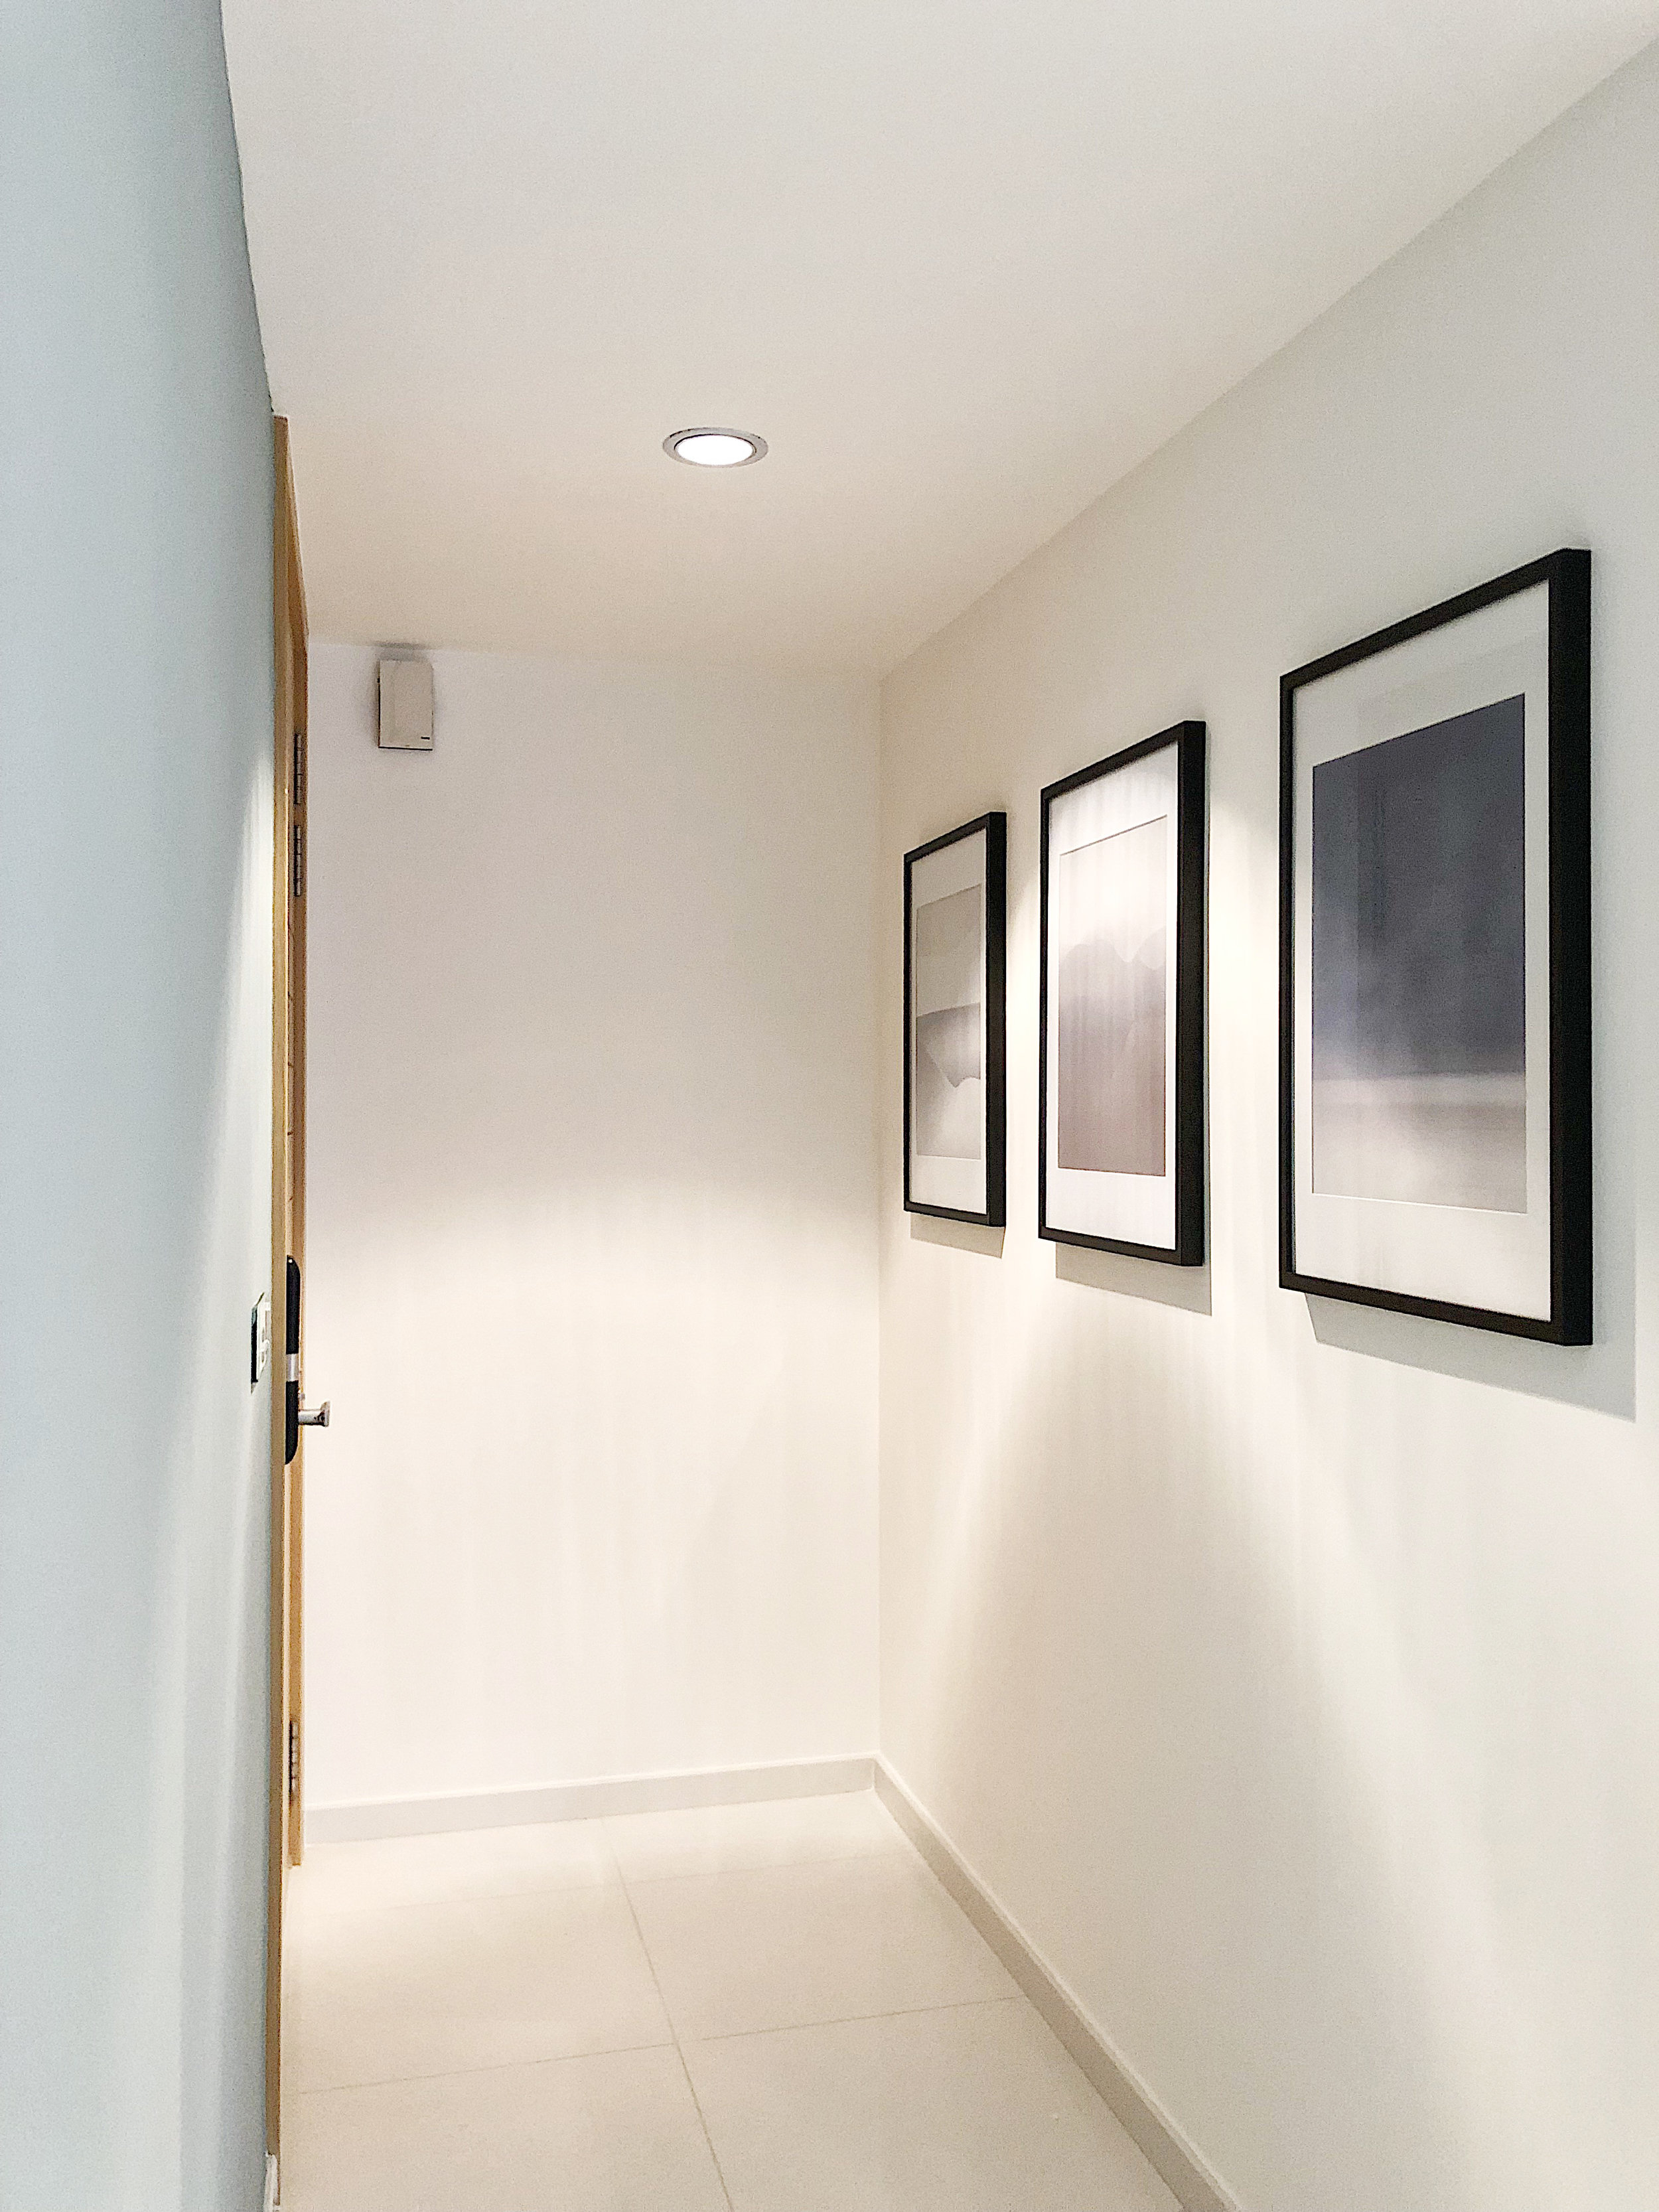 Simple Hallway Poster Artwork